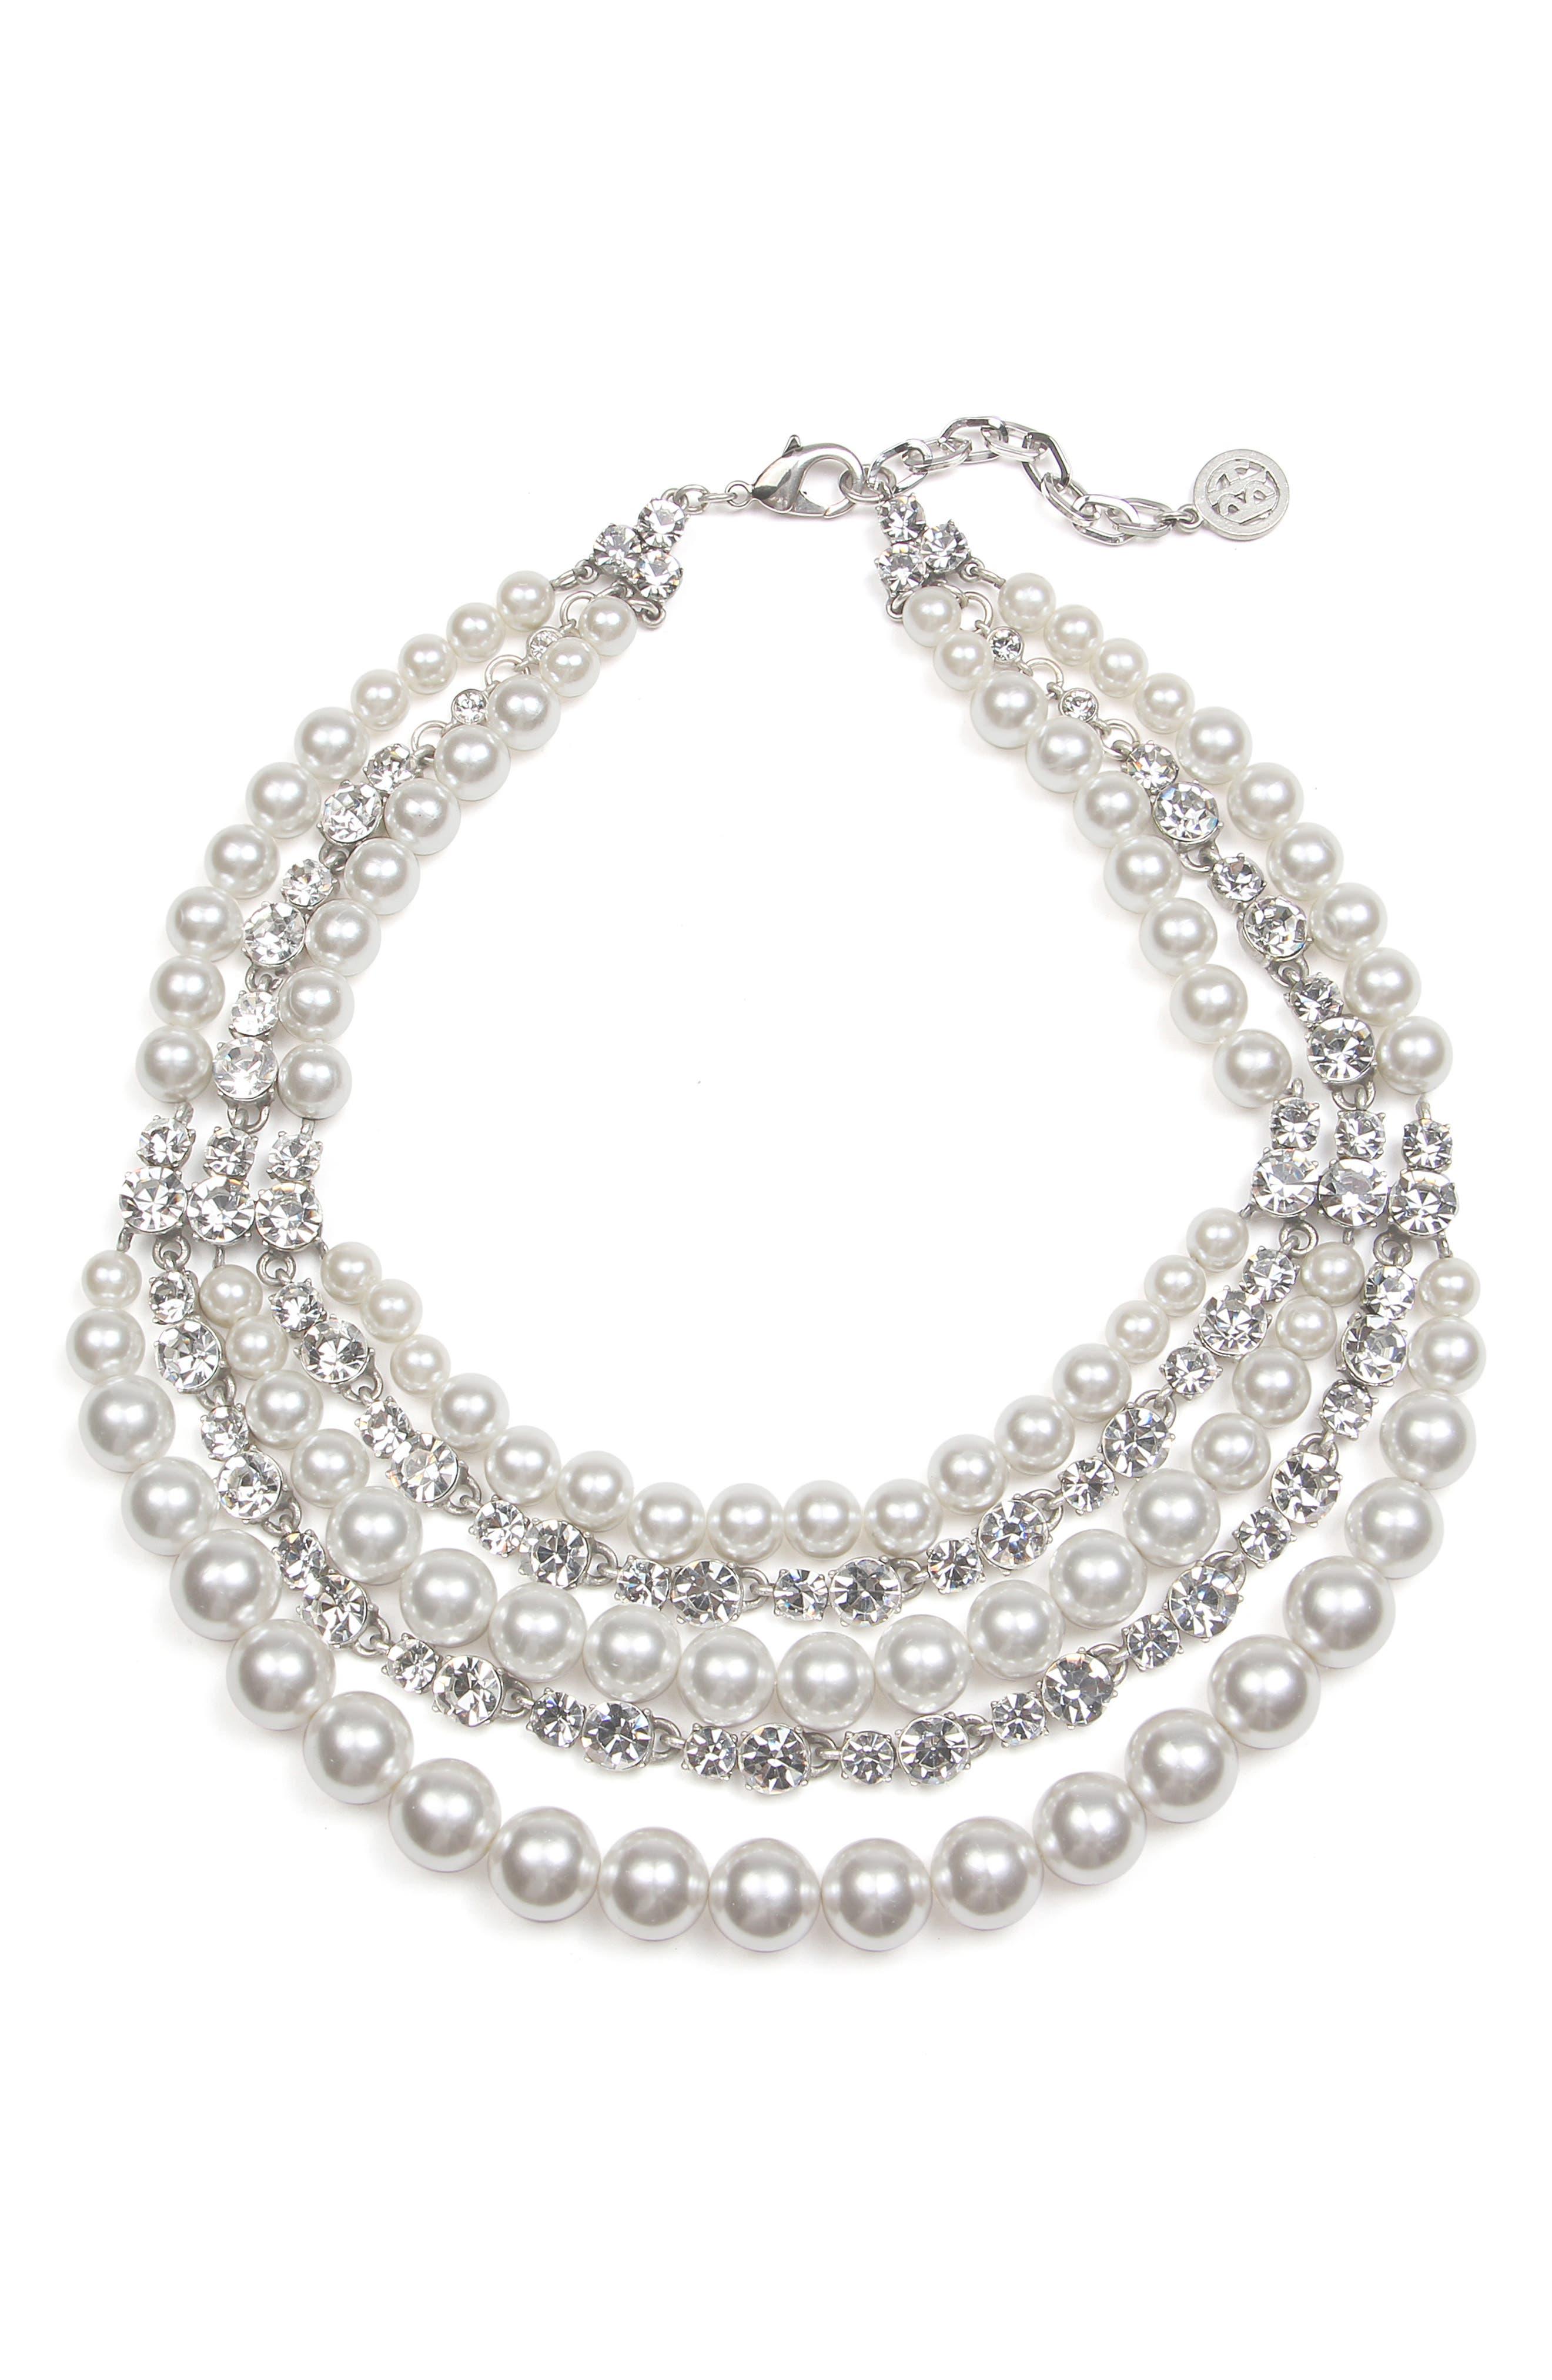 Crystal & Imitation Pearl Multistrand Torsade Necklace,                         Main,                         color, SILVER/ BEIGE